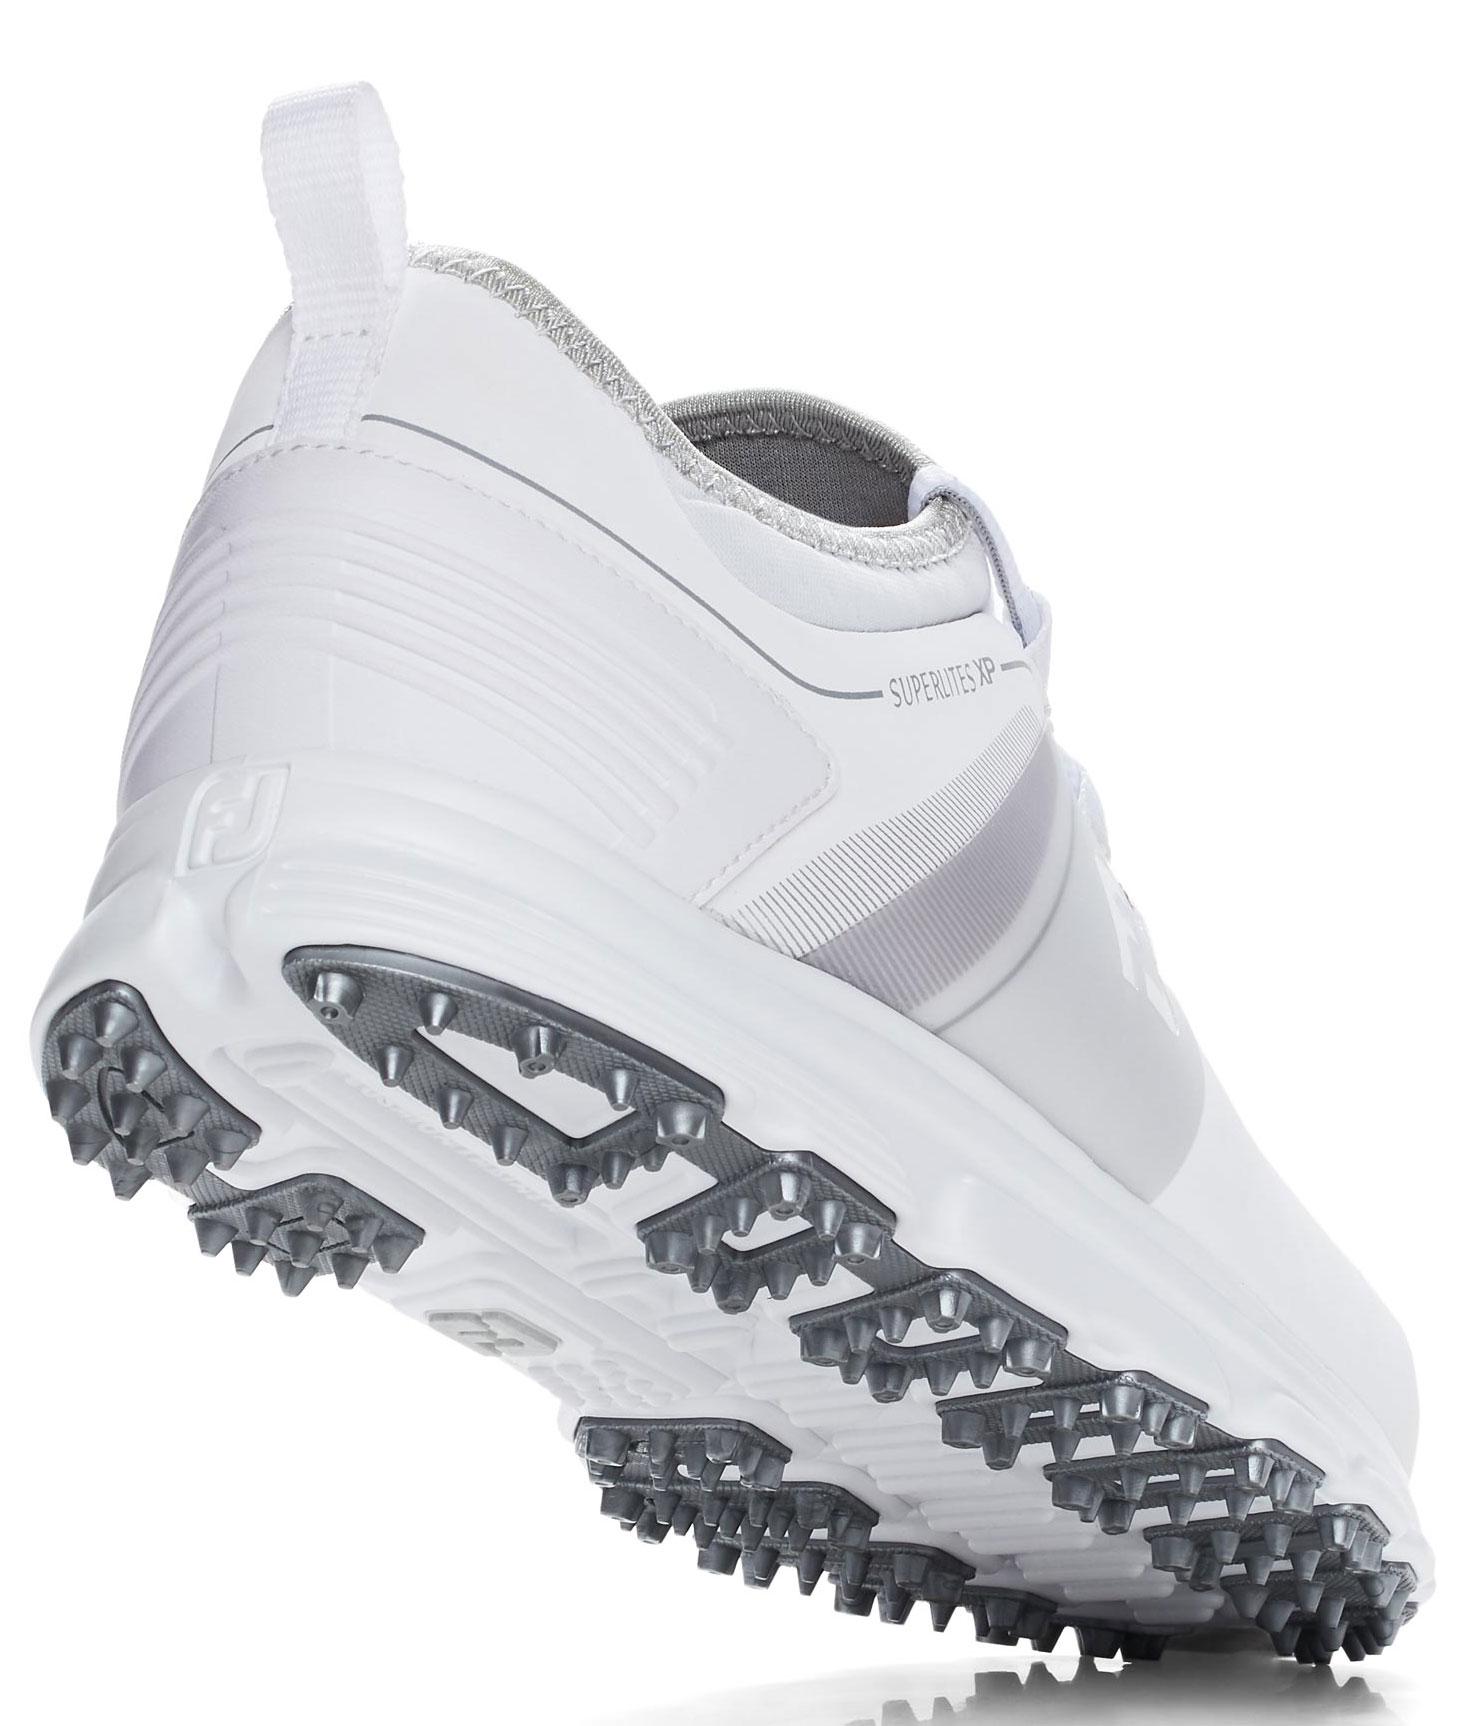 FootJoy-Superlites-XP-Golf-Shoes-Men-039-s-New thumbnail 15